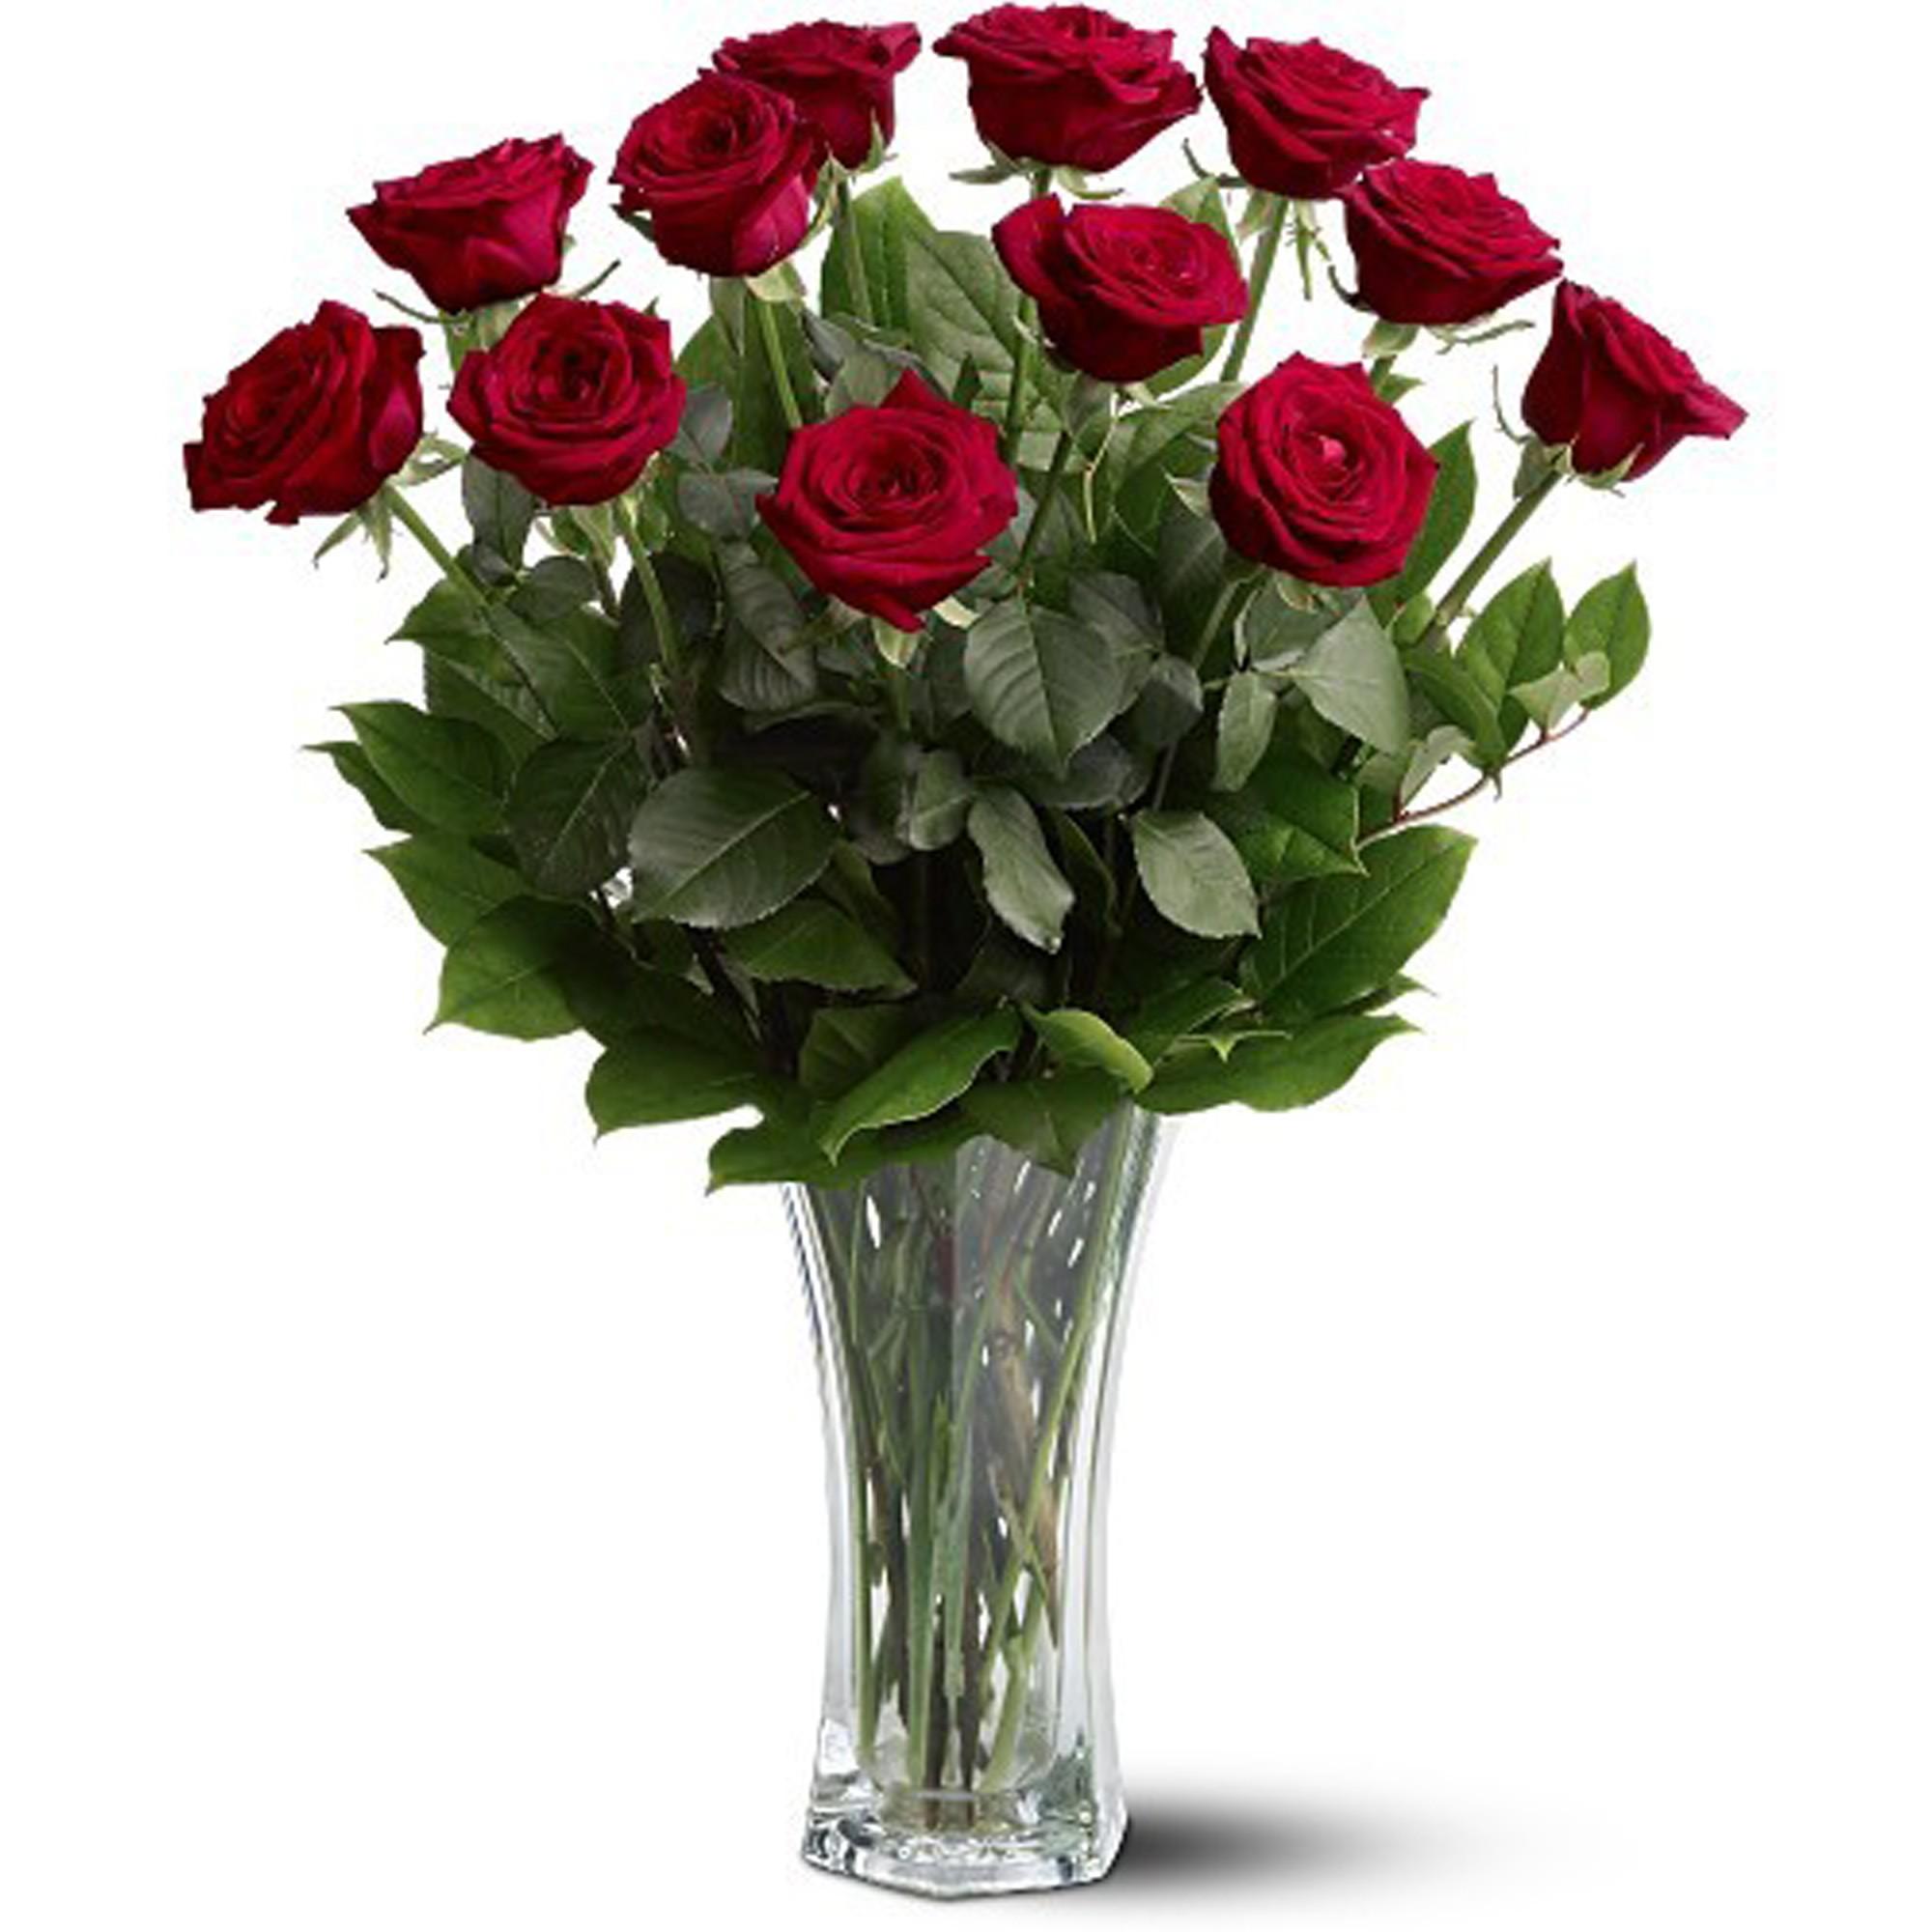 Bouquet clipart dozen rose. A premium red roses